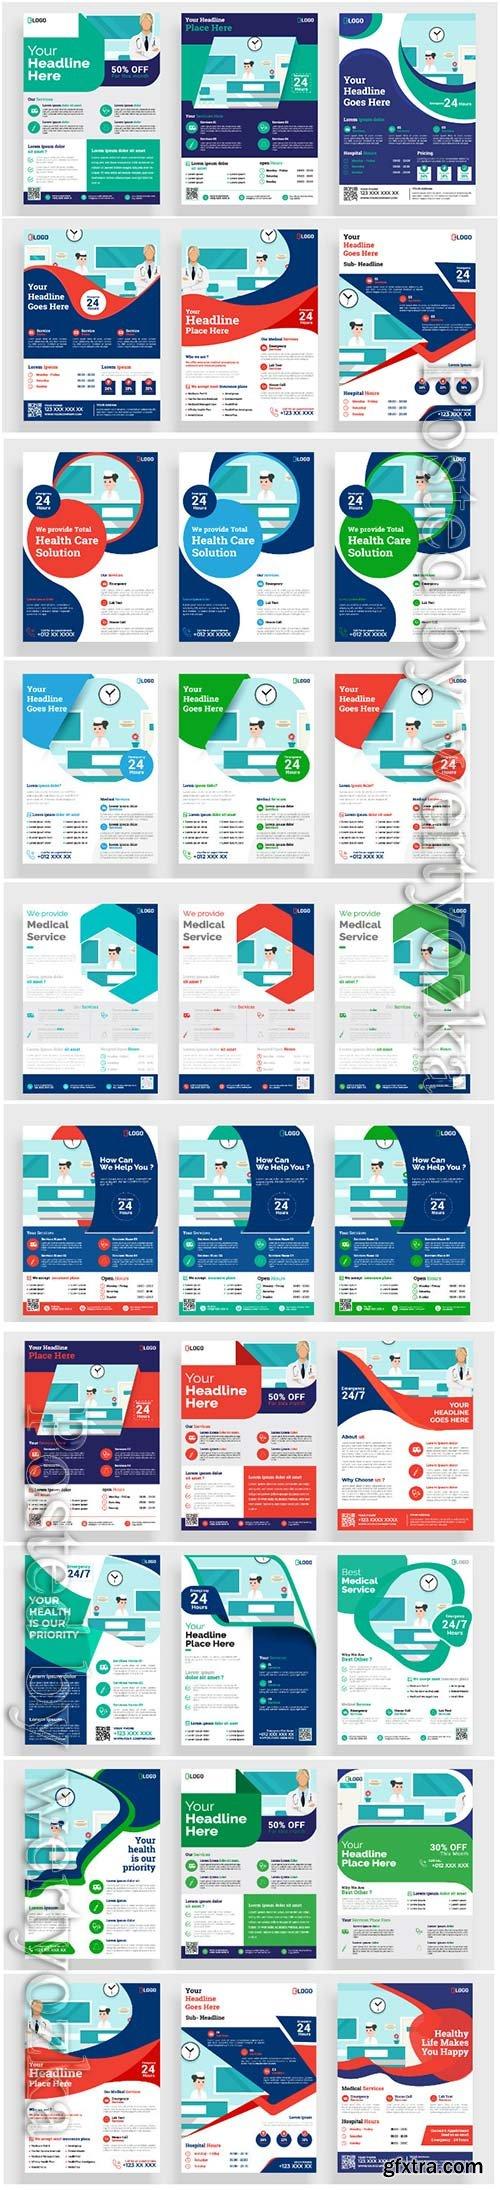 Medical flyer vector poster, brochure cover design layout background